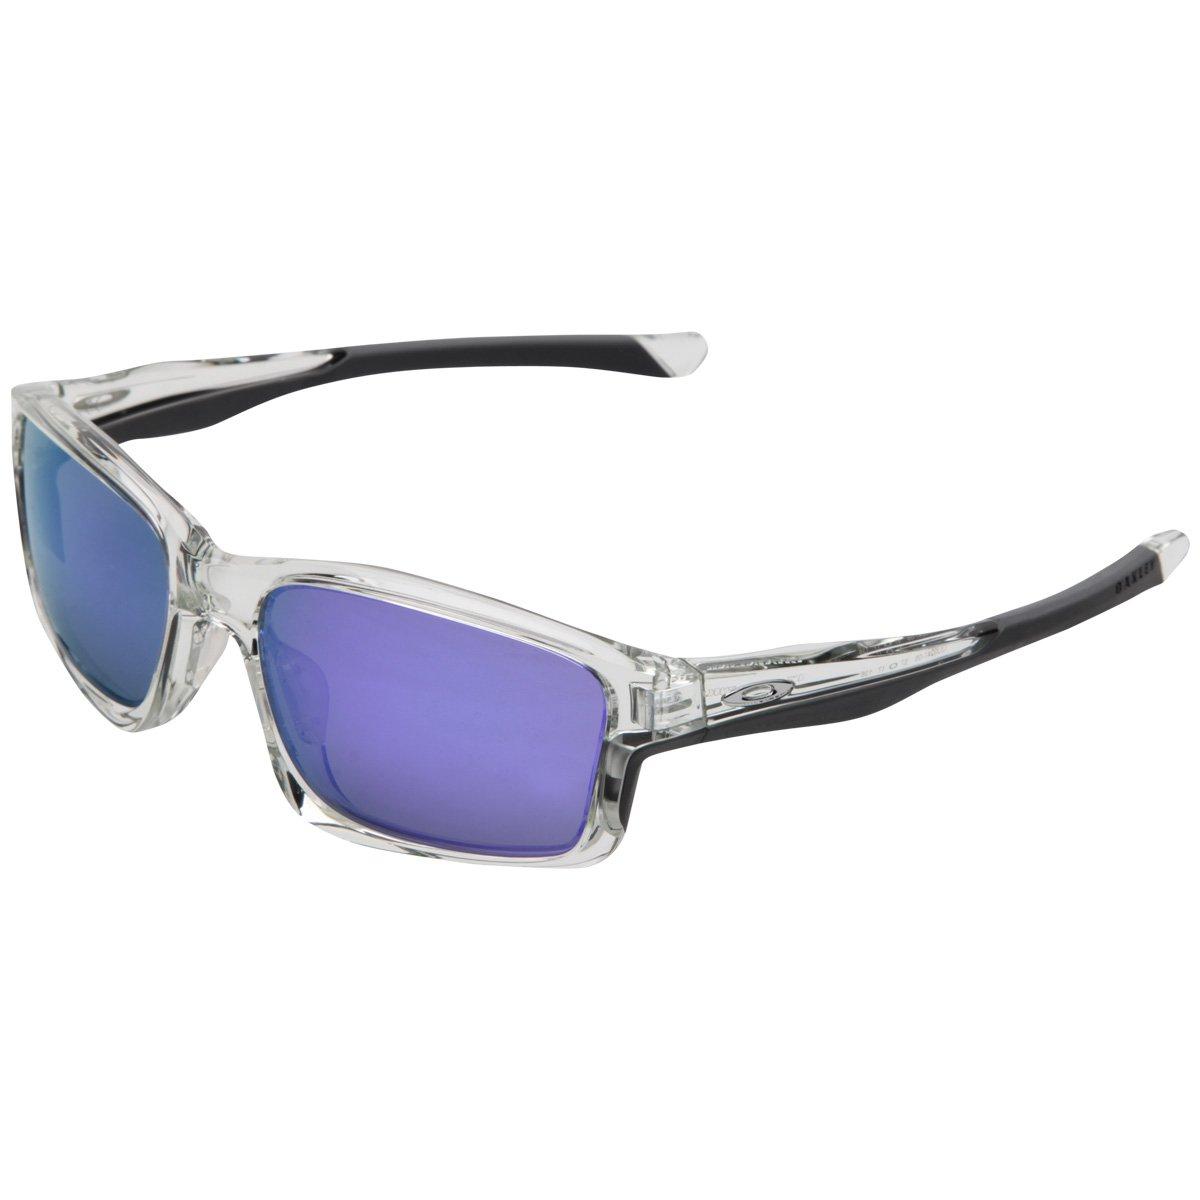 54e20852f2747 Óculos Oakley Chainlink - Iridium - Compre Agora   Zattini